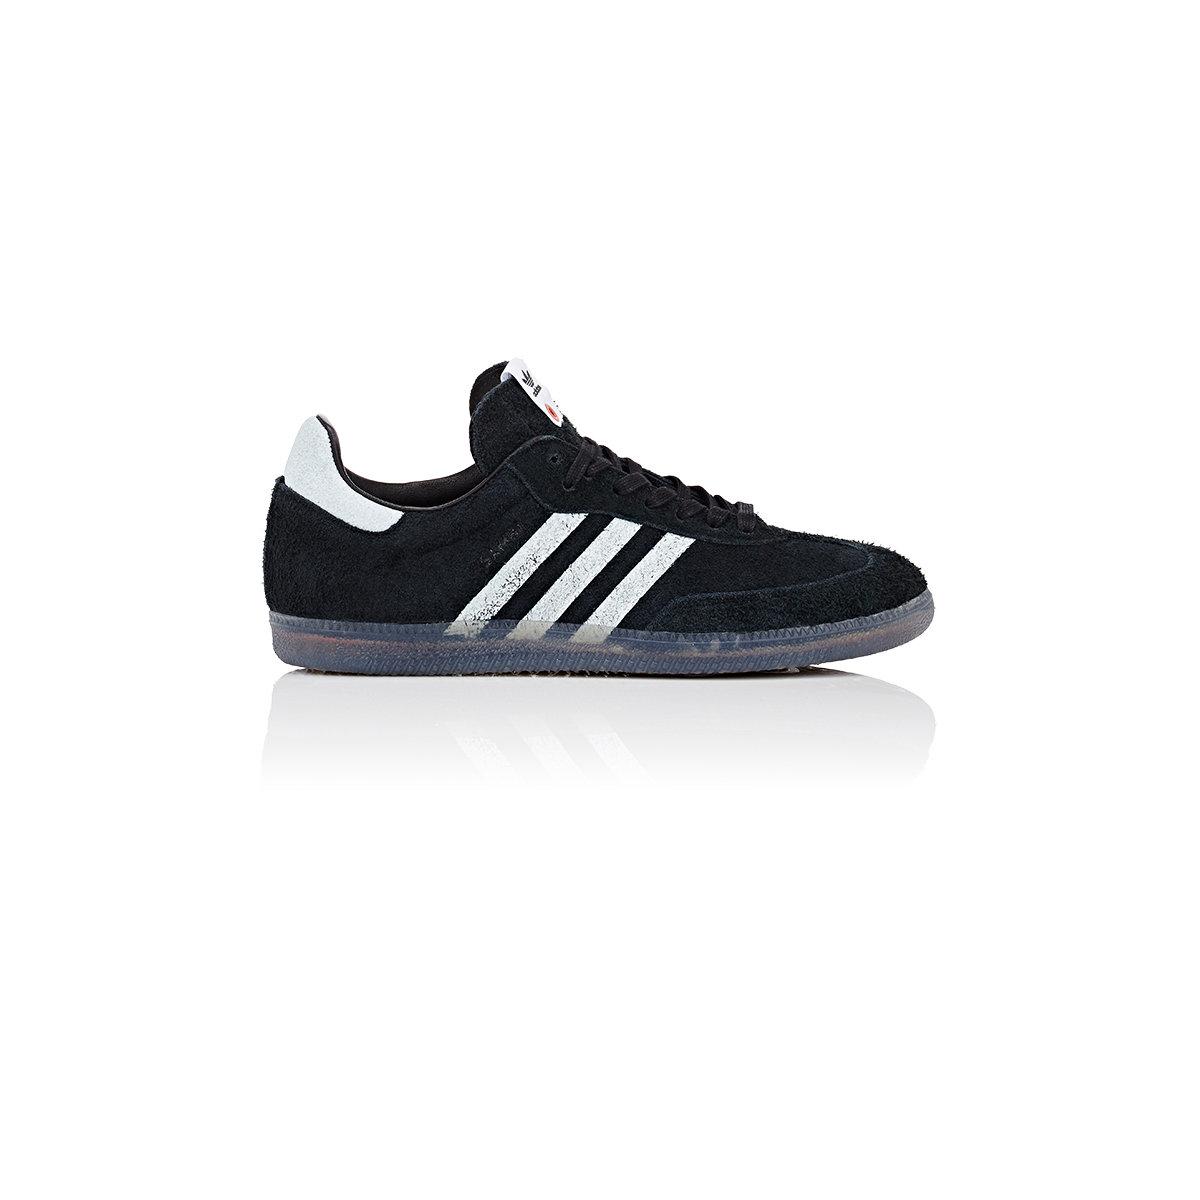 lyst adidas originals samba suede sneakers in black for men. Black Bedroom Furniture Sets. Home Design Ideas